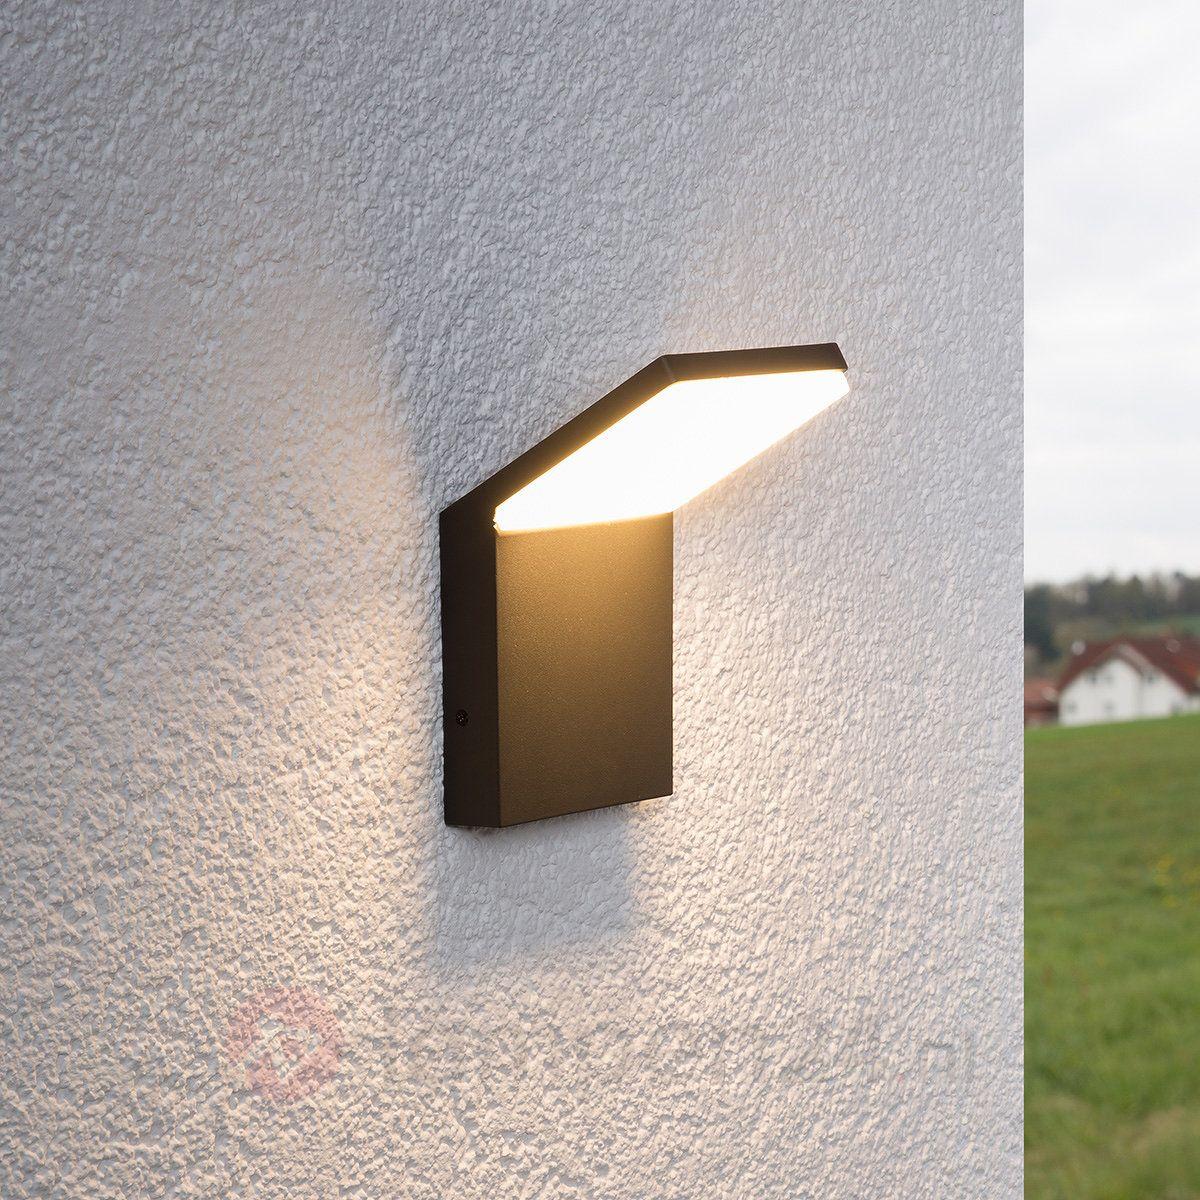 Waban - LED-buitenwandlamp 9619039 - summer cabin | Pinterest ...